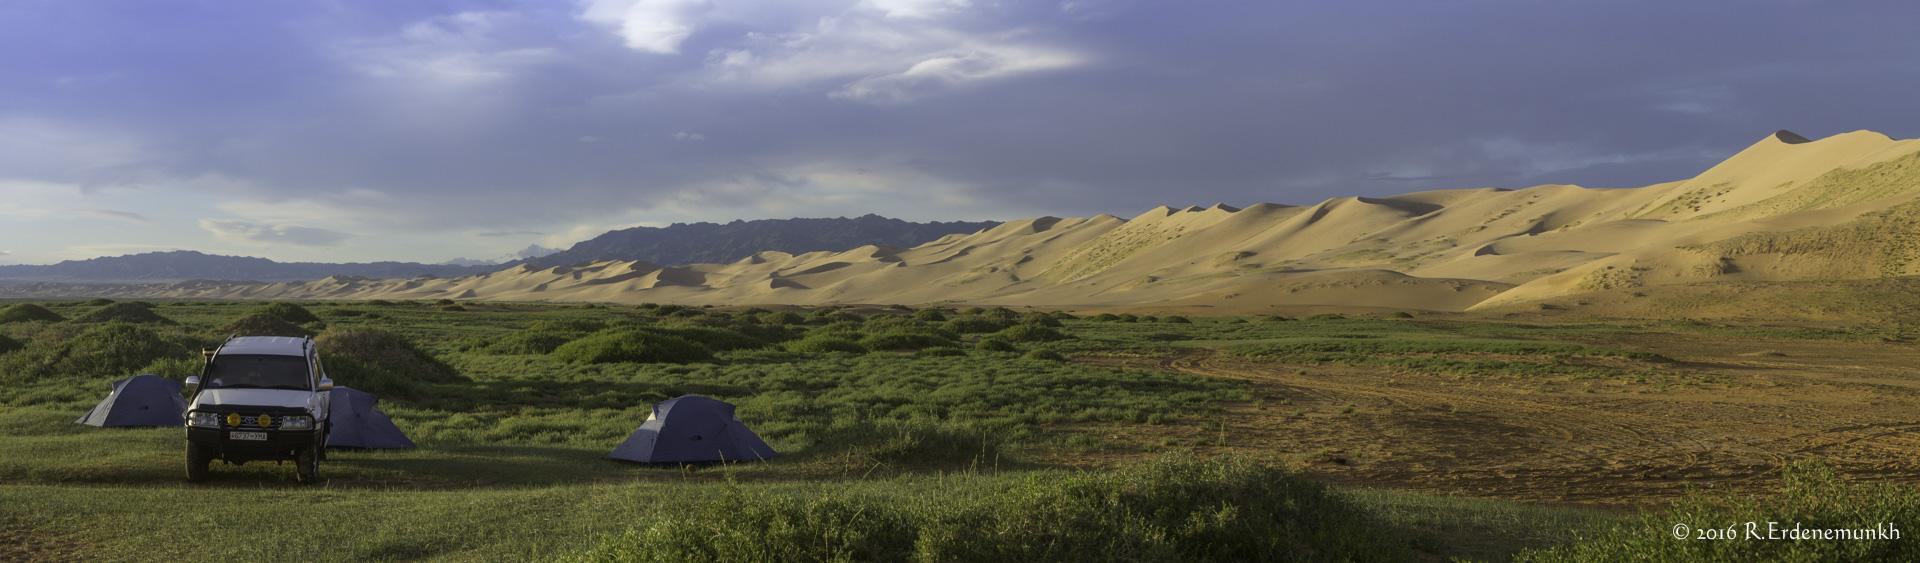 Camping at Khongoriin Els